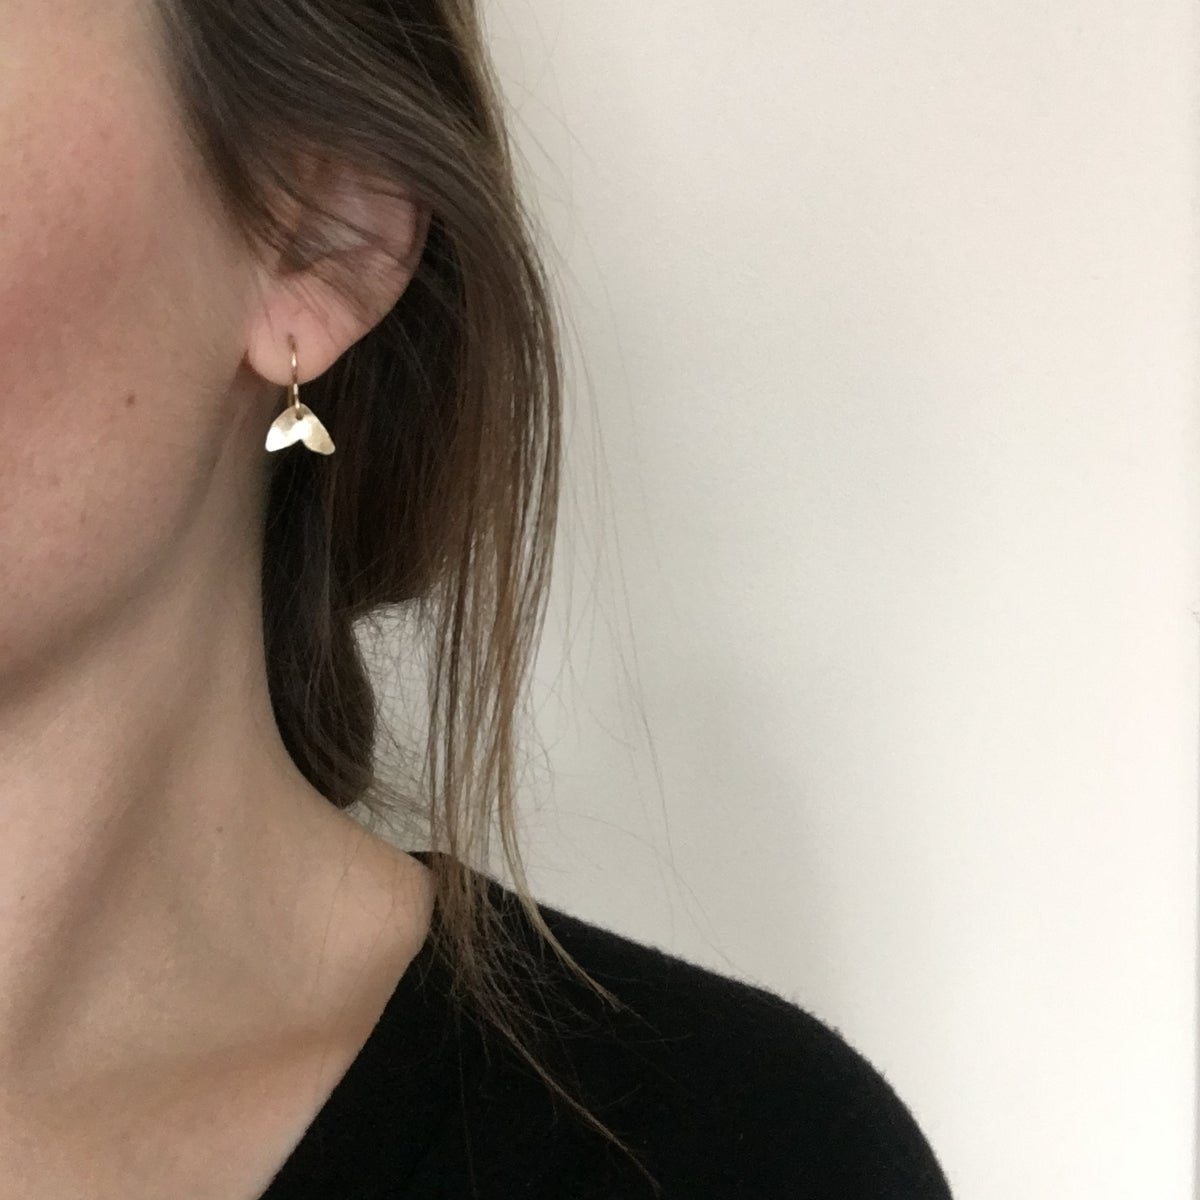 Image of bud earring brass